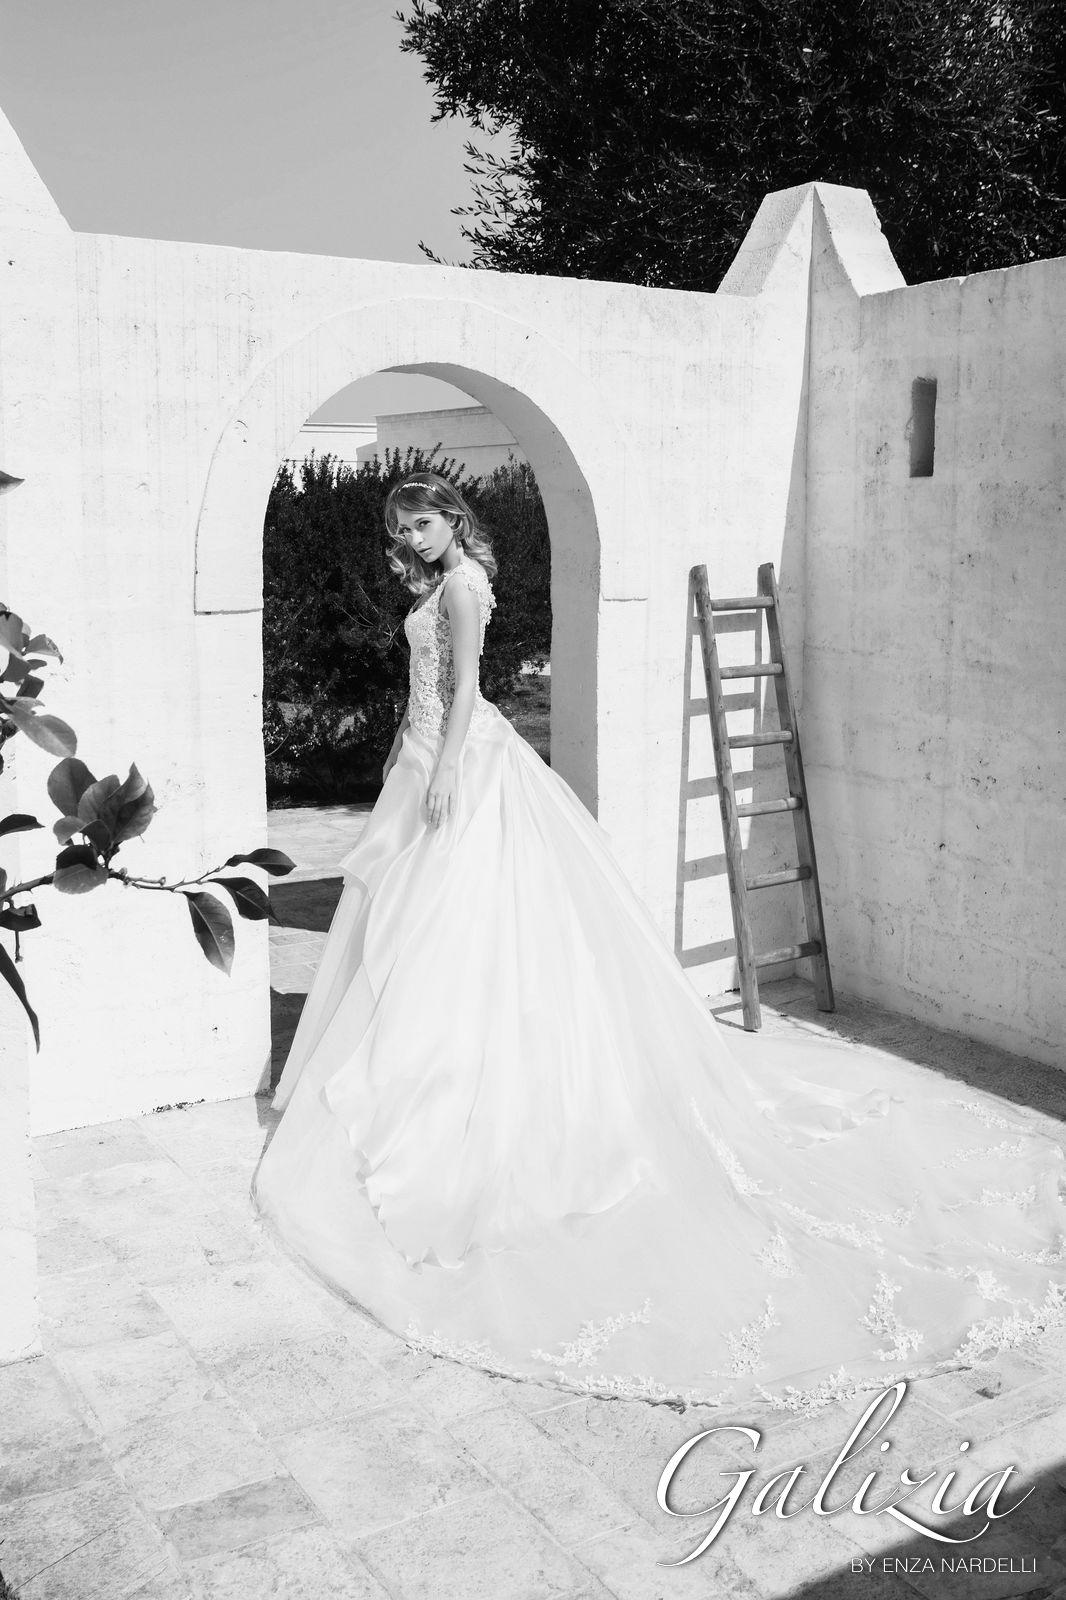 9d11ed27457f Collection 2018 - Galizia Spose by Enza Nardelli - GaliziaSpose.it